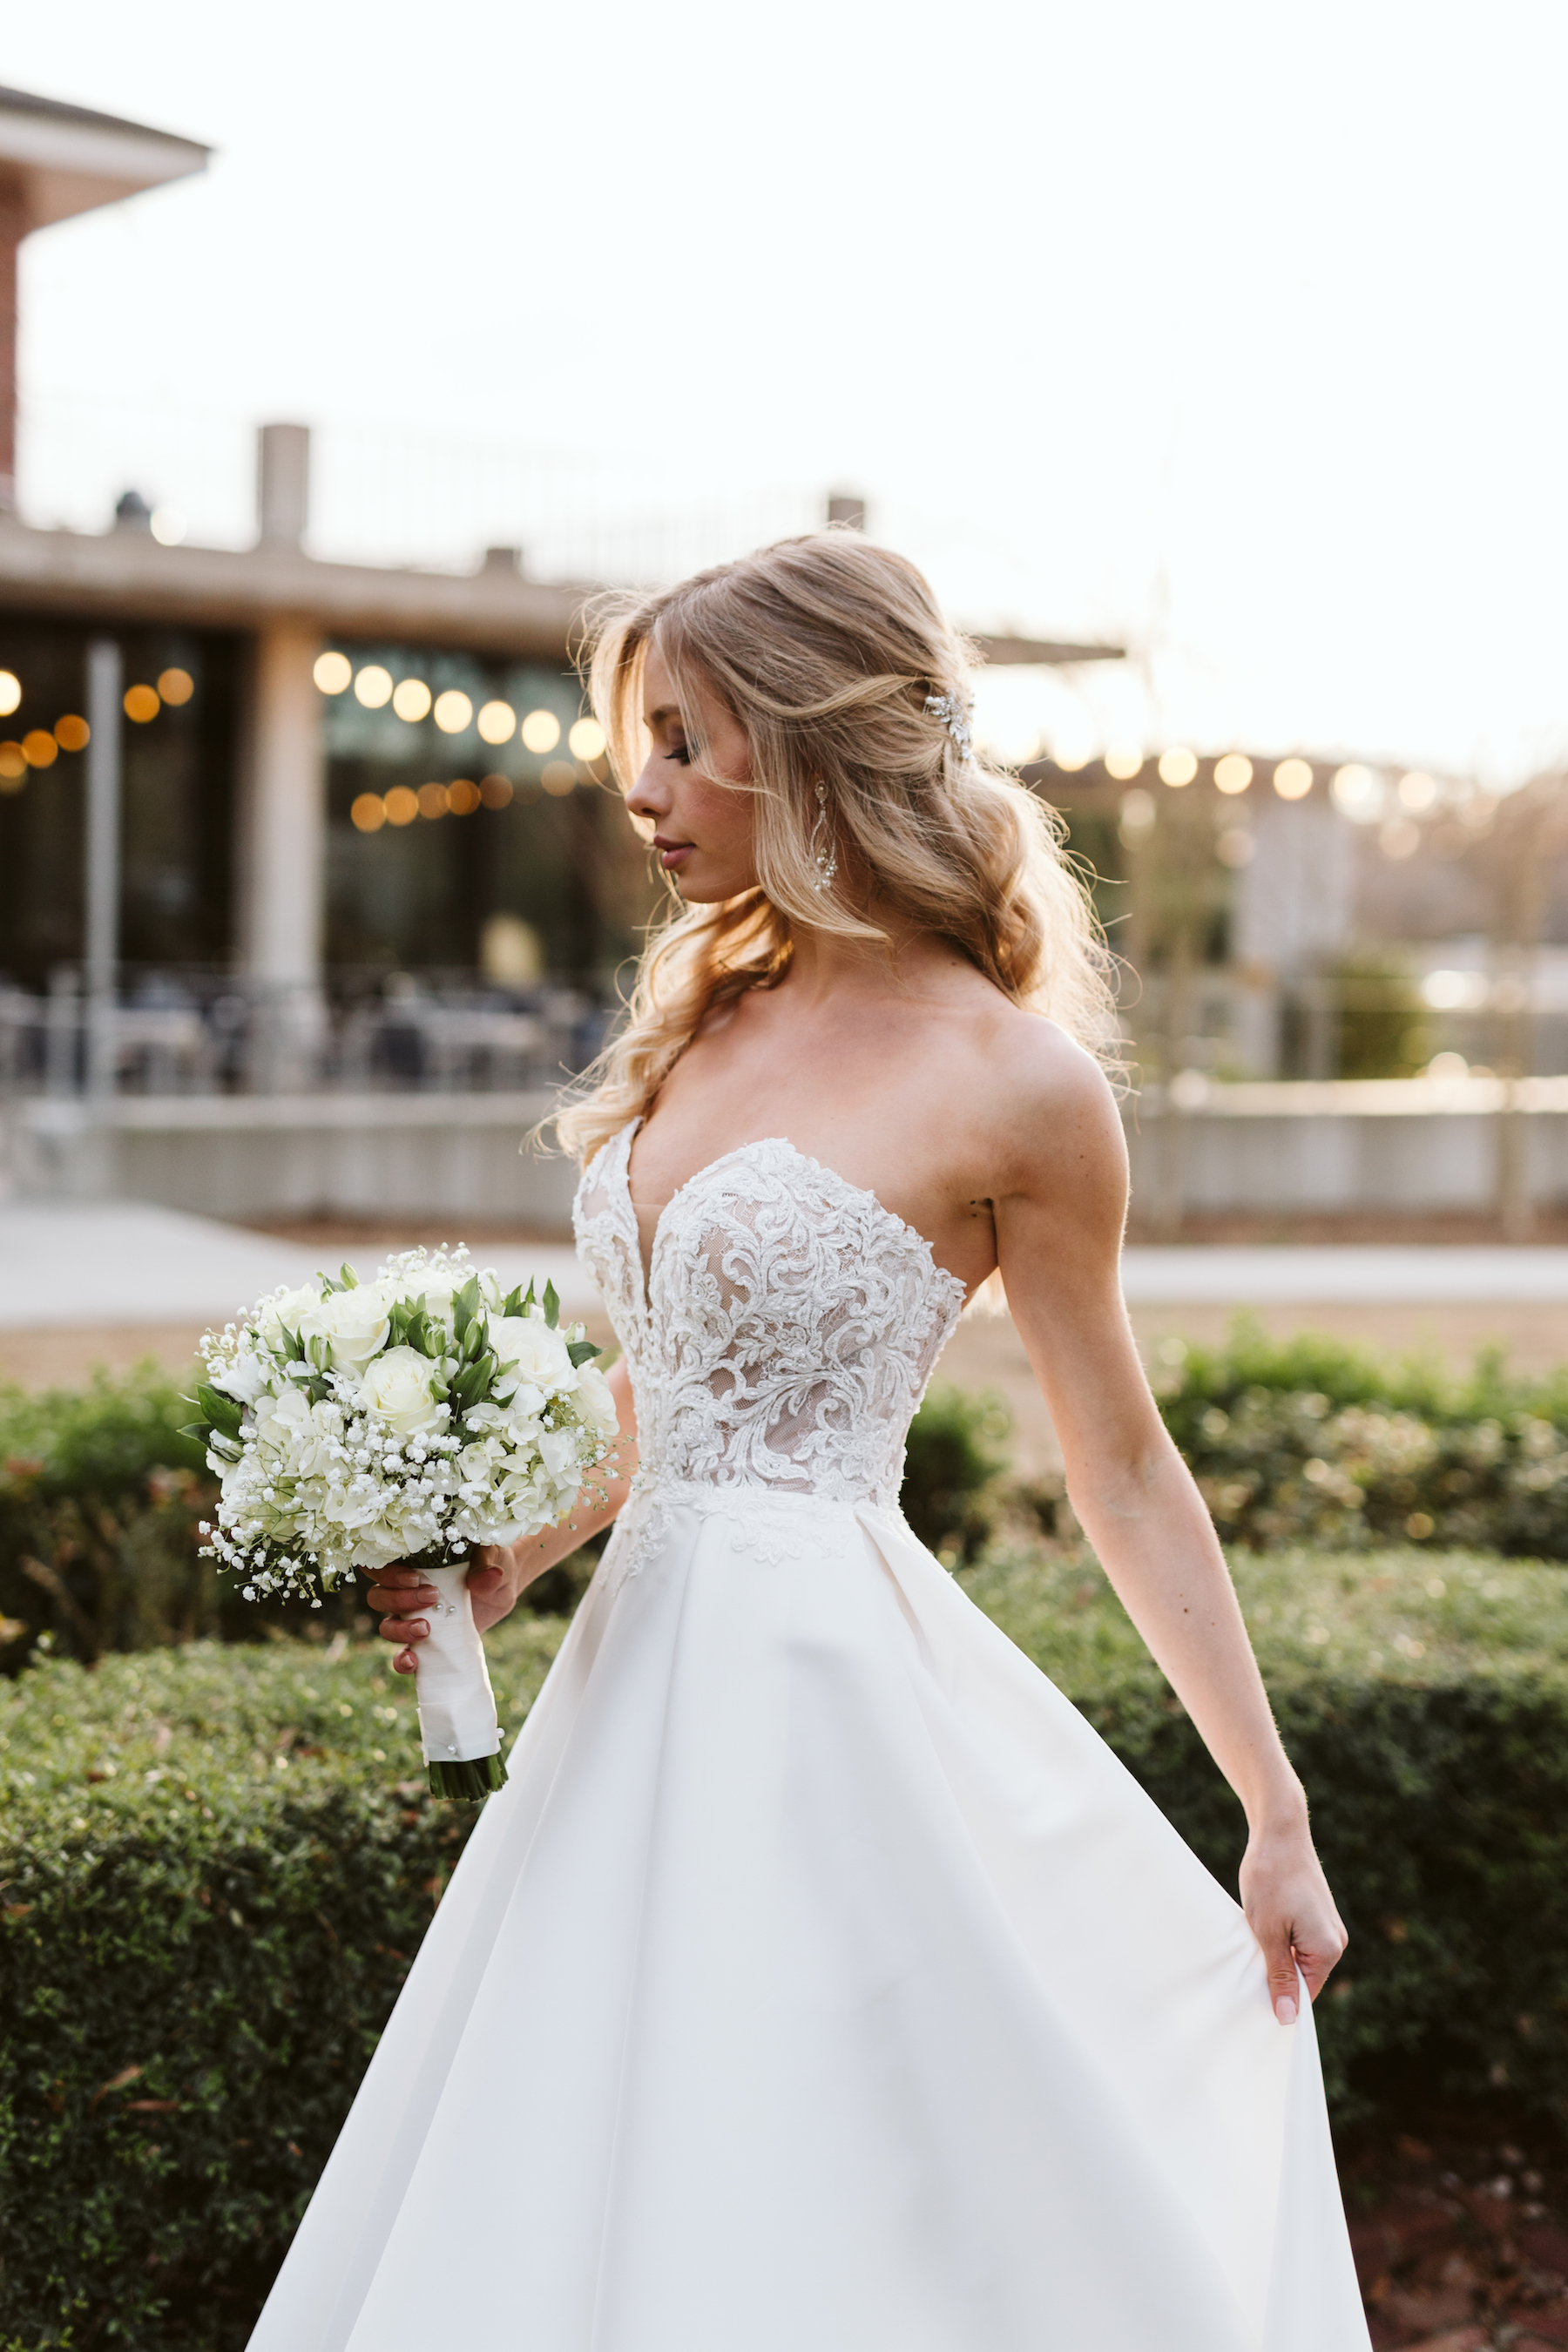 furman-university-bridals-paige-219.JPG